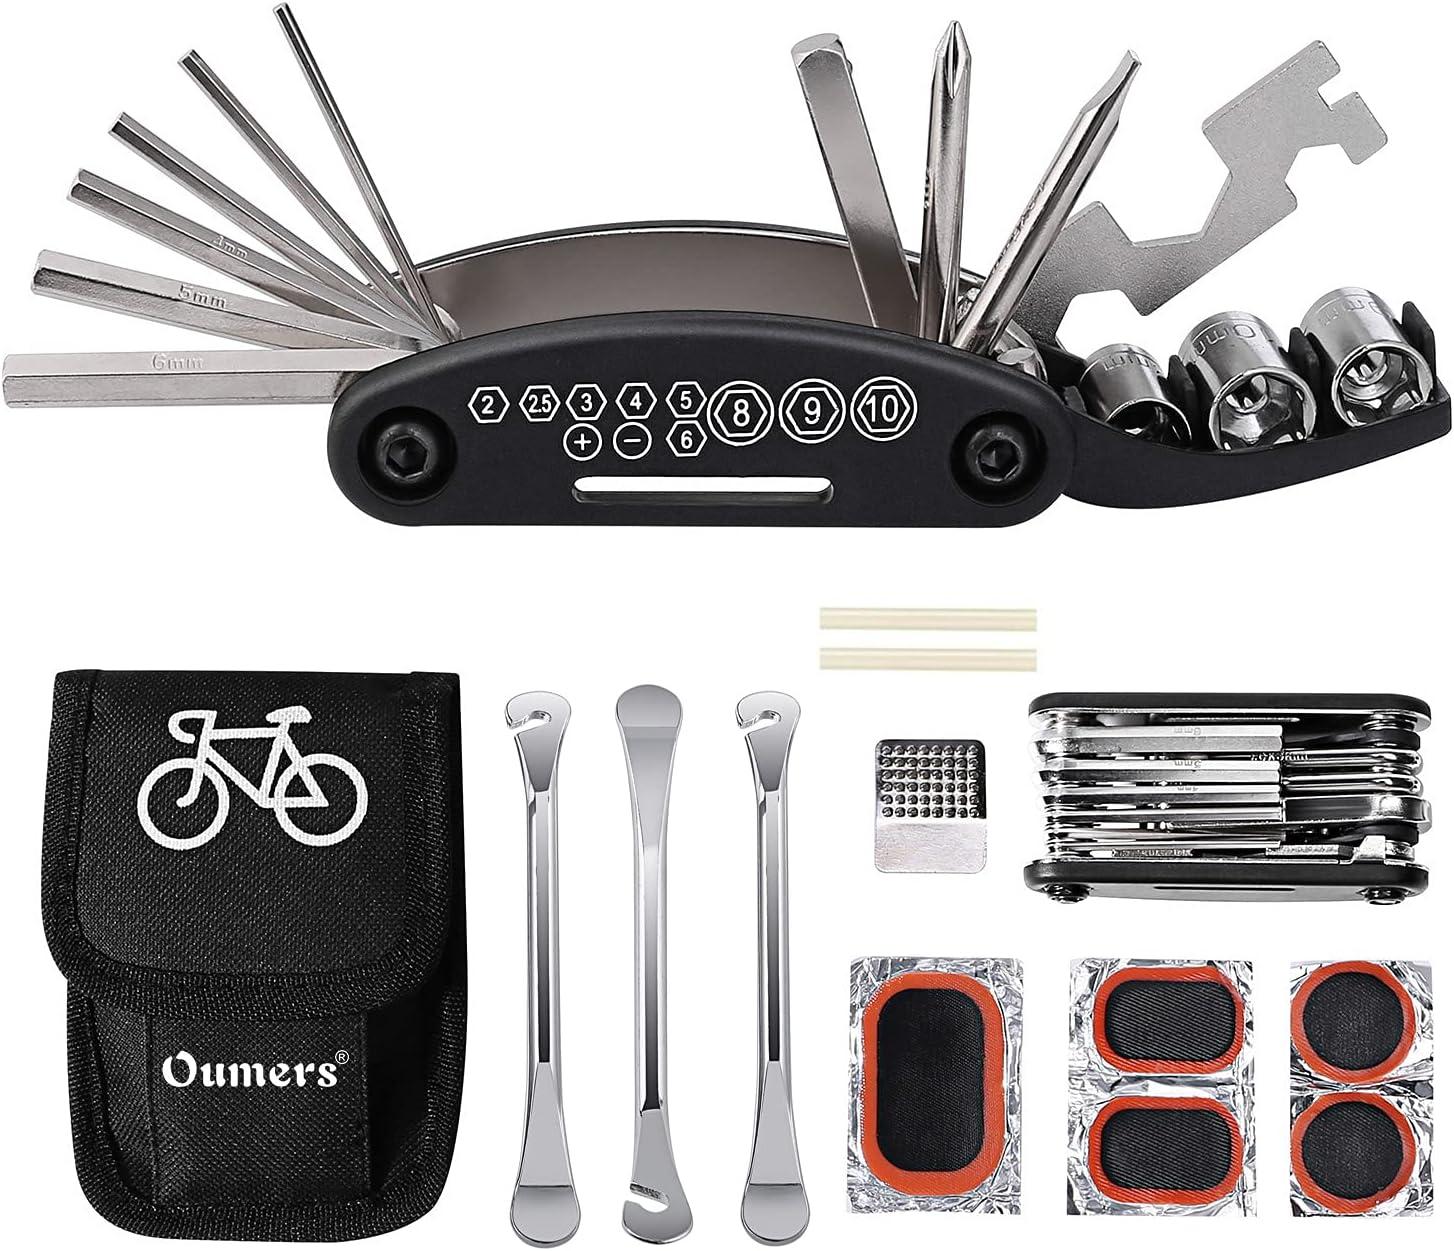 Oumers wholesale Multi-Function Bike Bicycle Cycling Kit Mechanic B Repair Rare